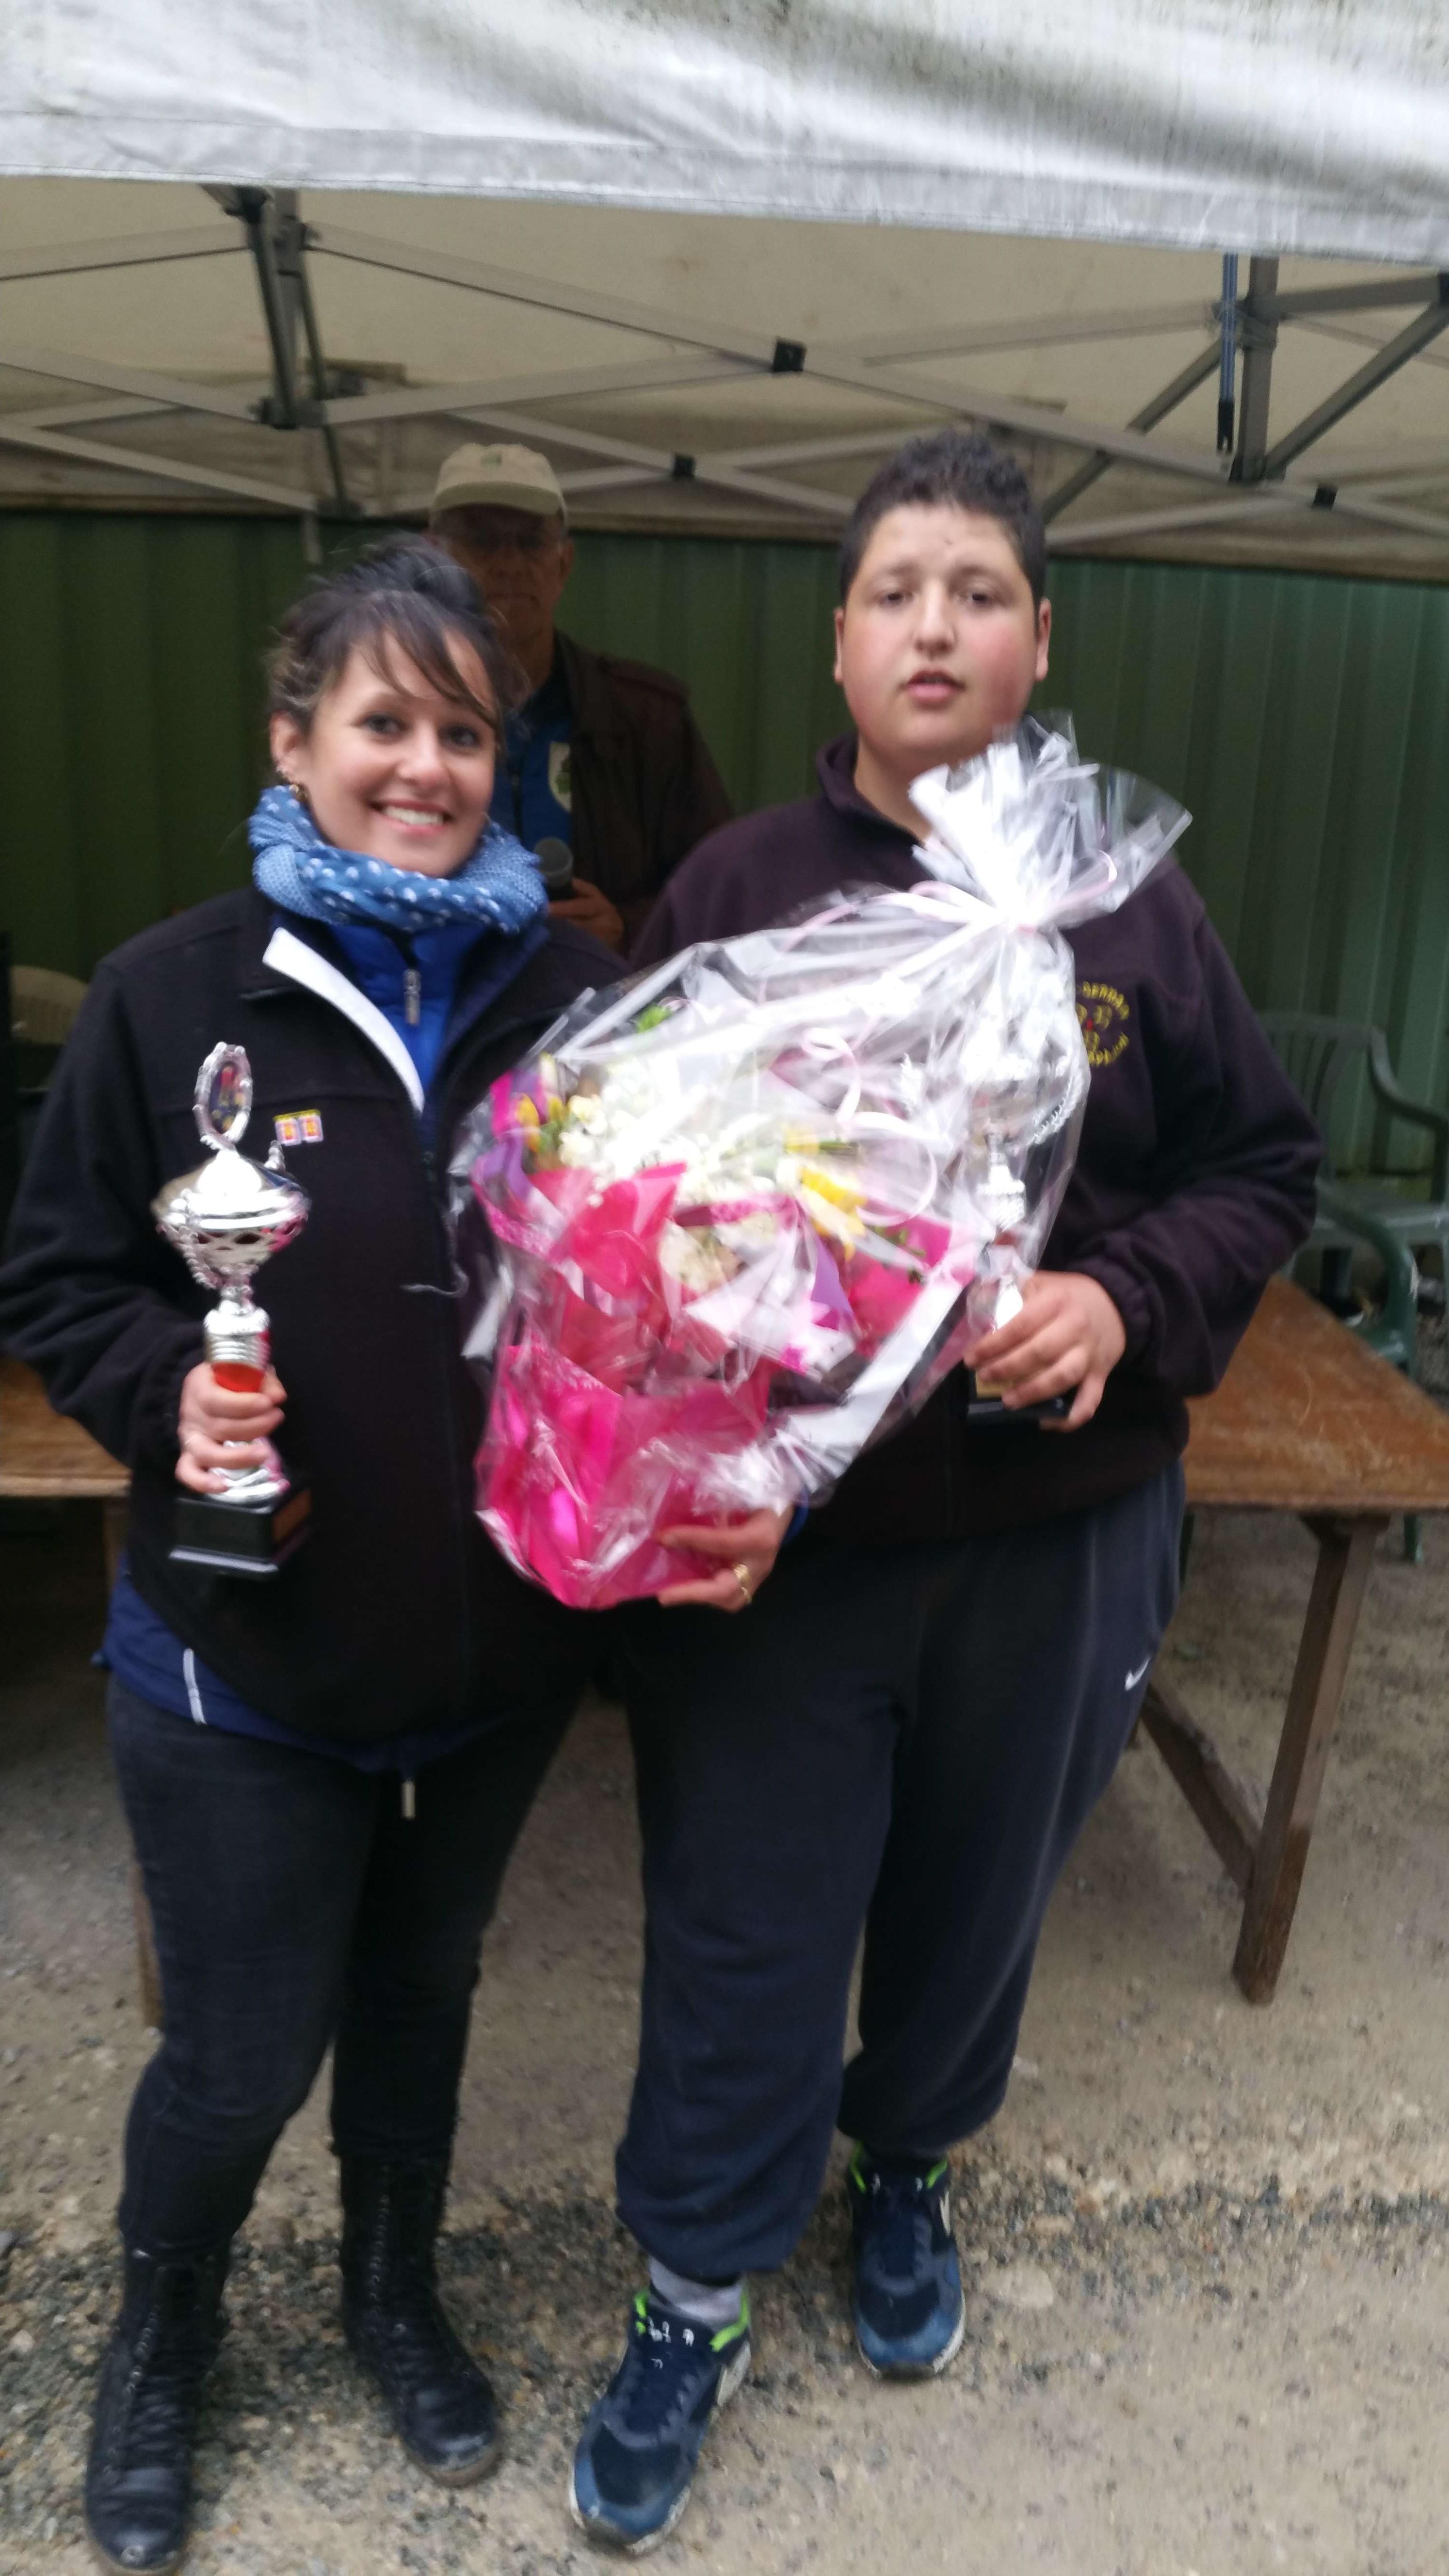 Les finalistes C. Samoye & N. Allioui du club de SGA